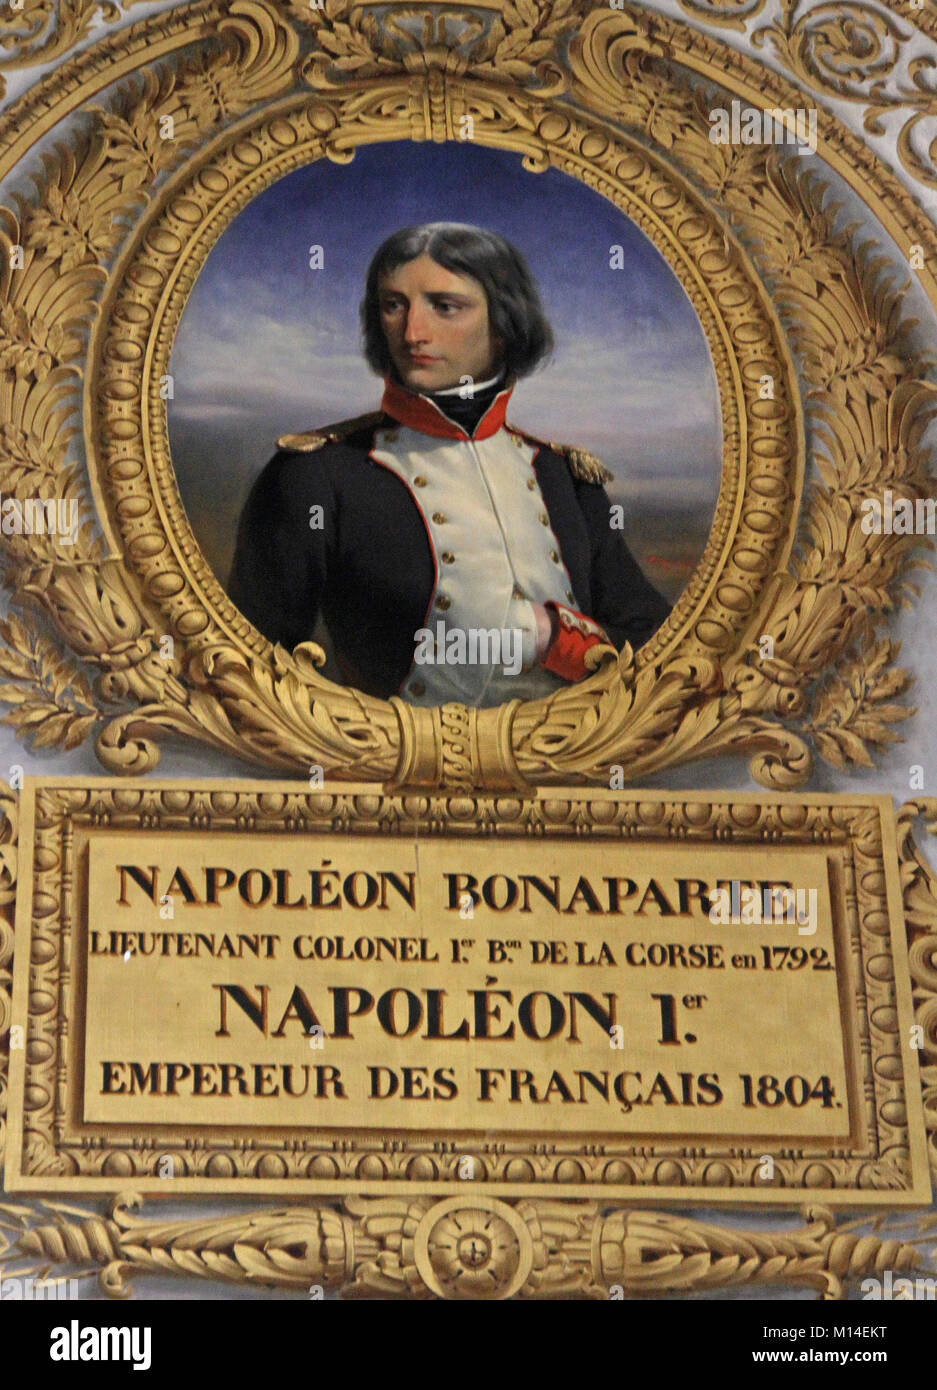 Oil canvas painting portrait of Napoleon Bonaparte as a Lieutenant Colonel of the Corsican National Guard by Henri - Stock Image